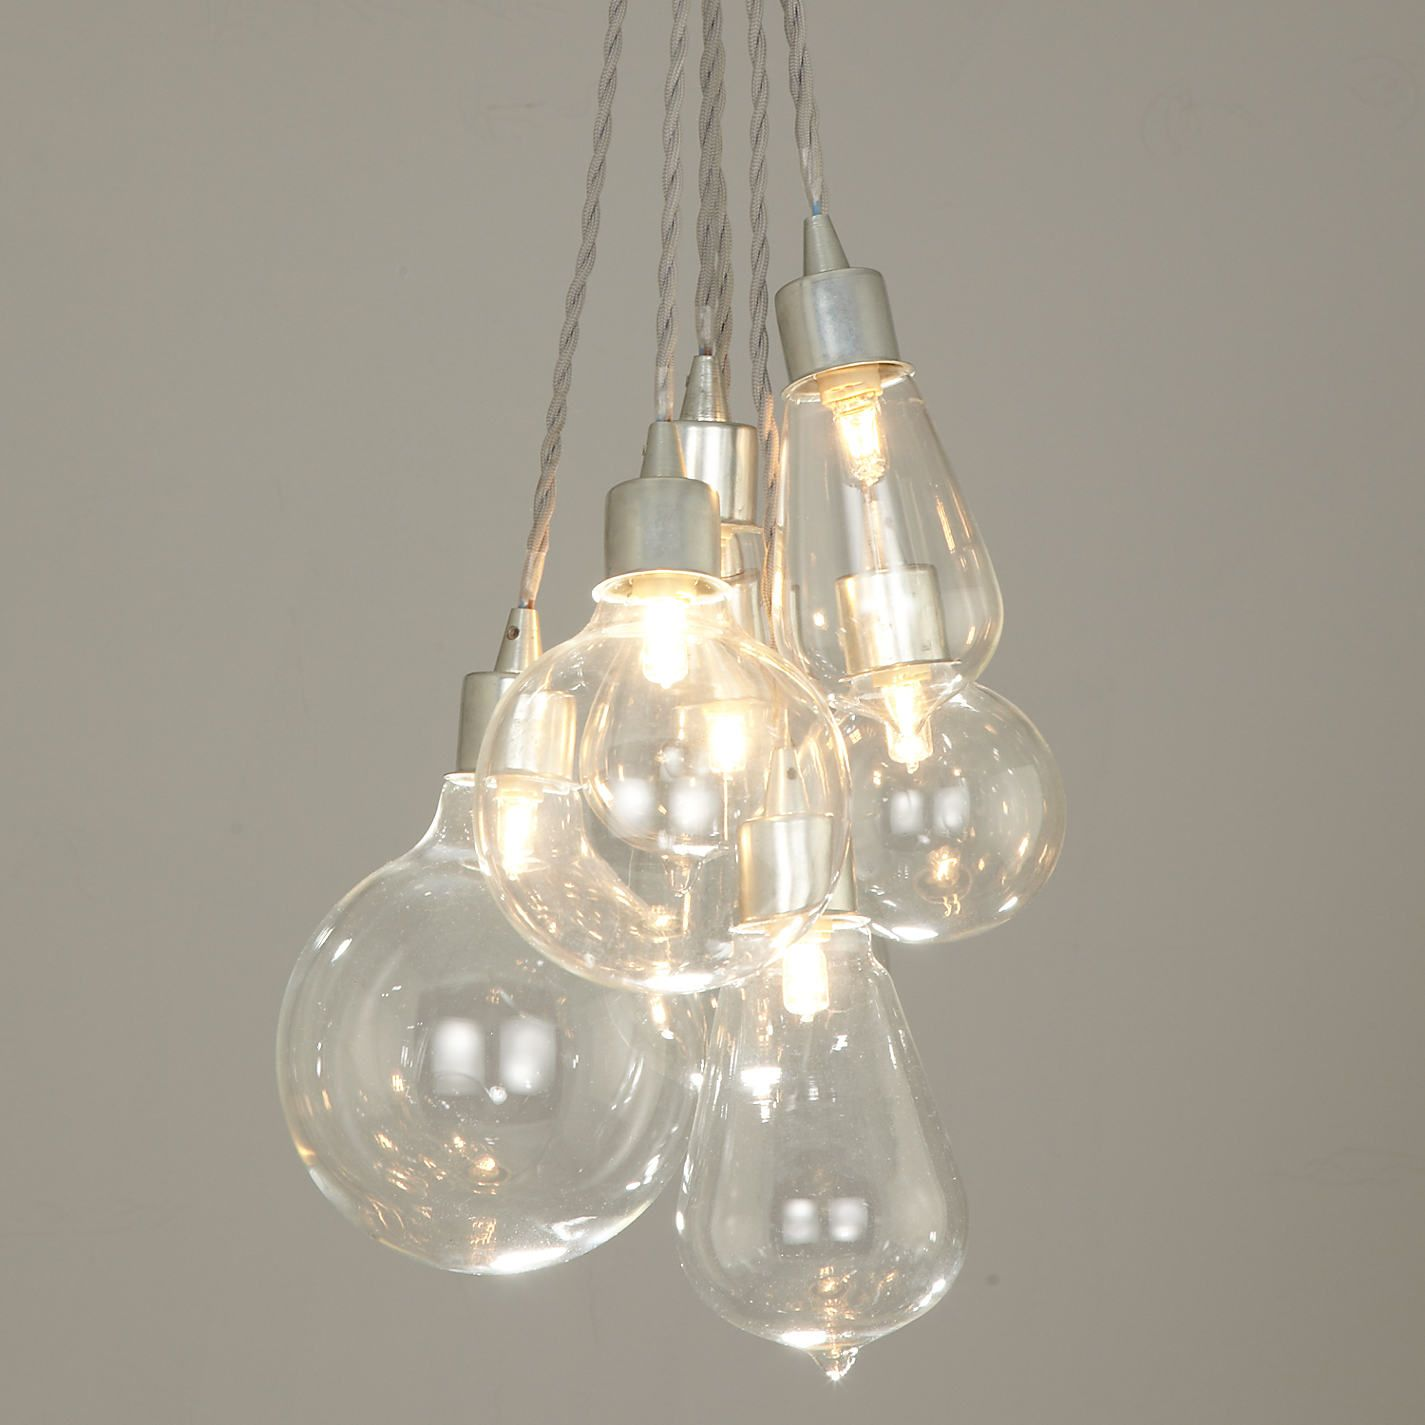 Buy John Lewis Croft Collection Kinsley Glass Dangle Cluster Ceiling Light | John Lewis